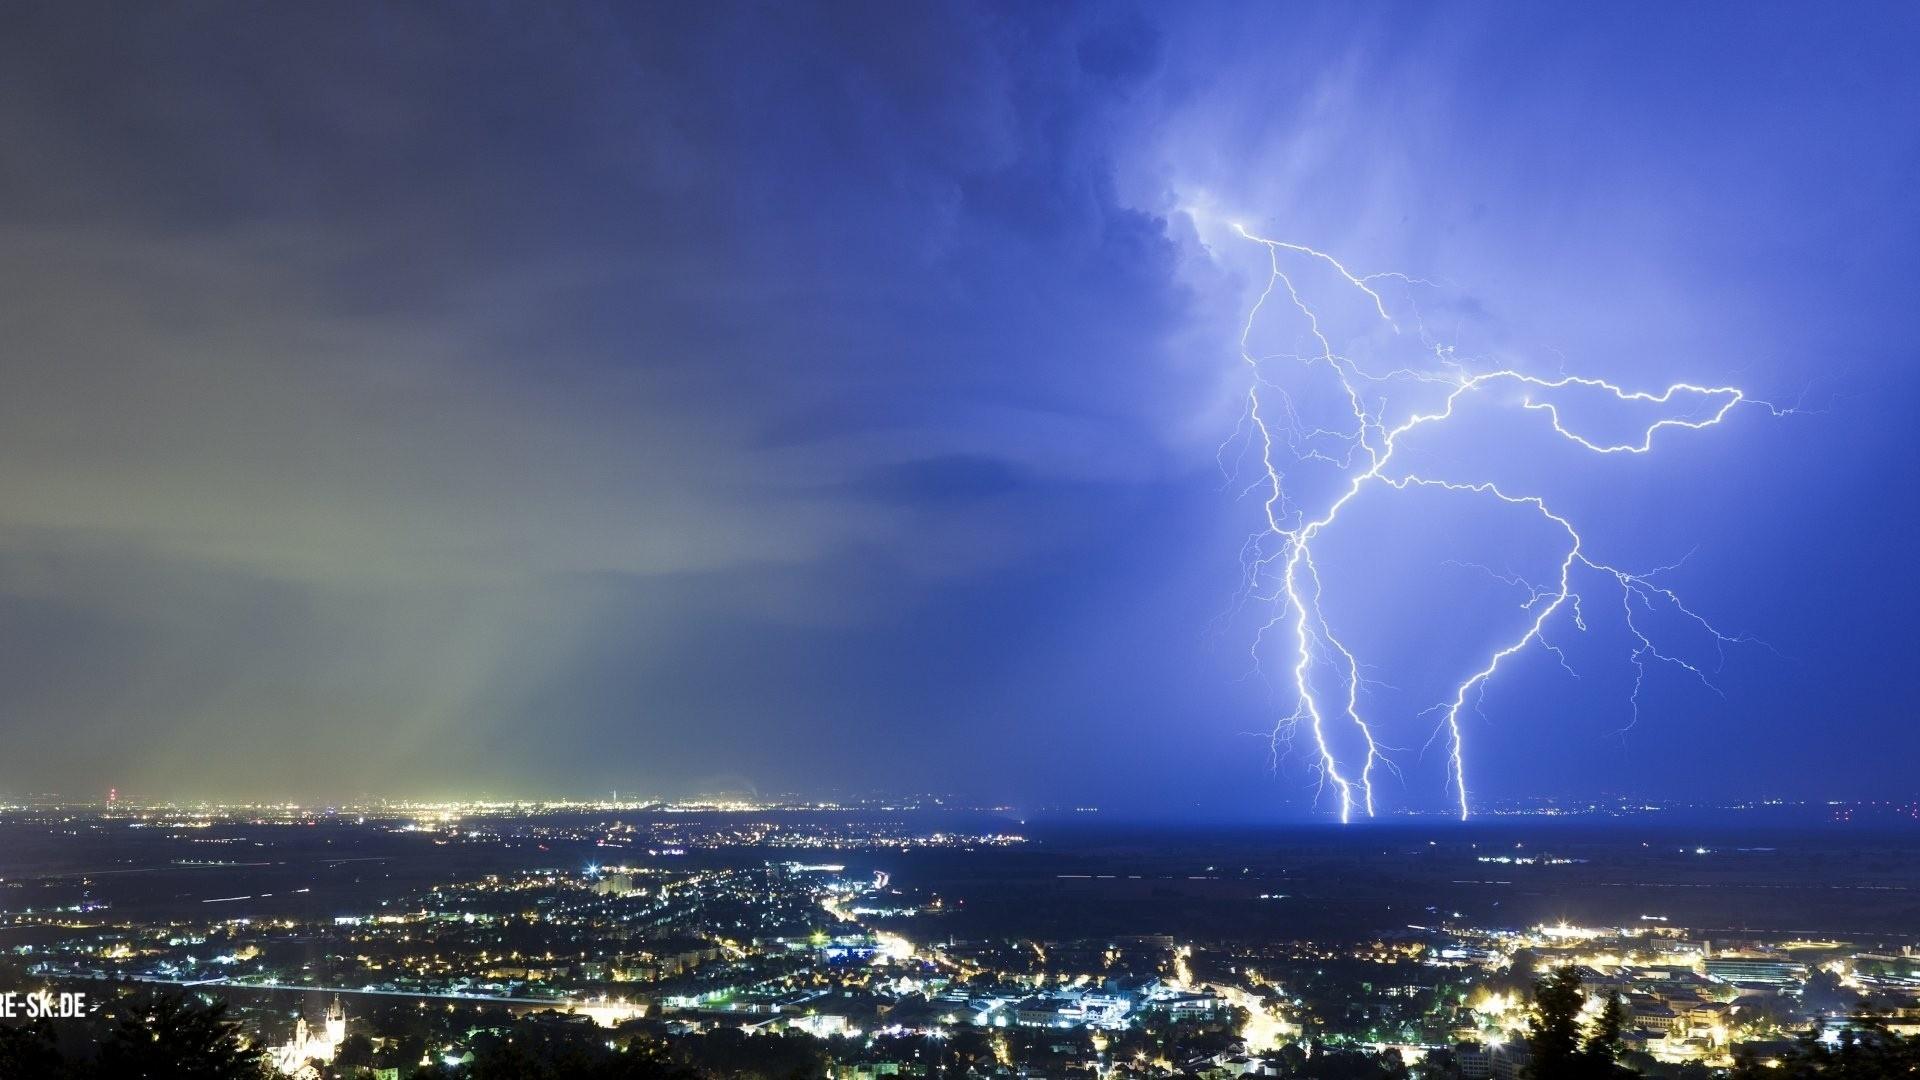 Lightning wallpaper photo hd